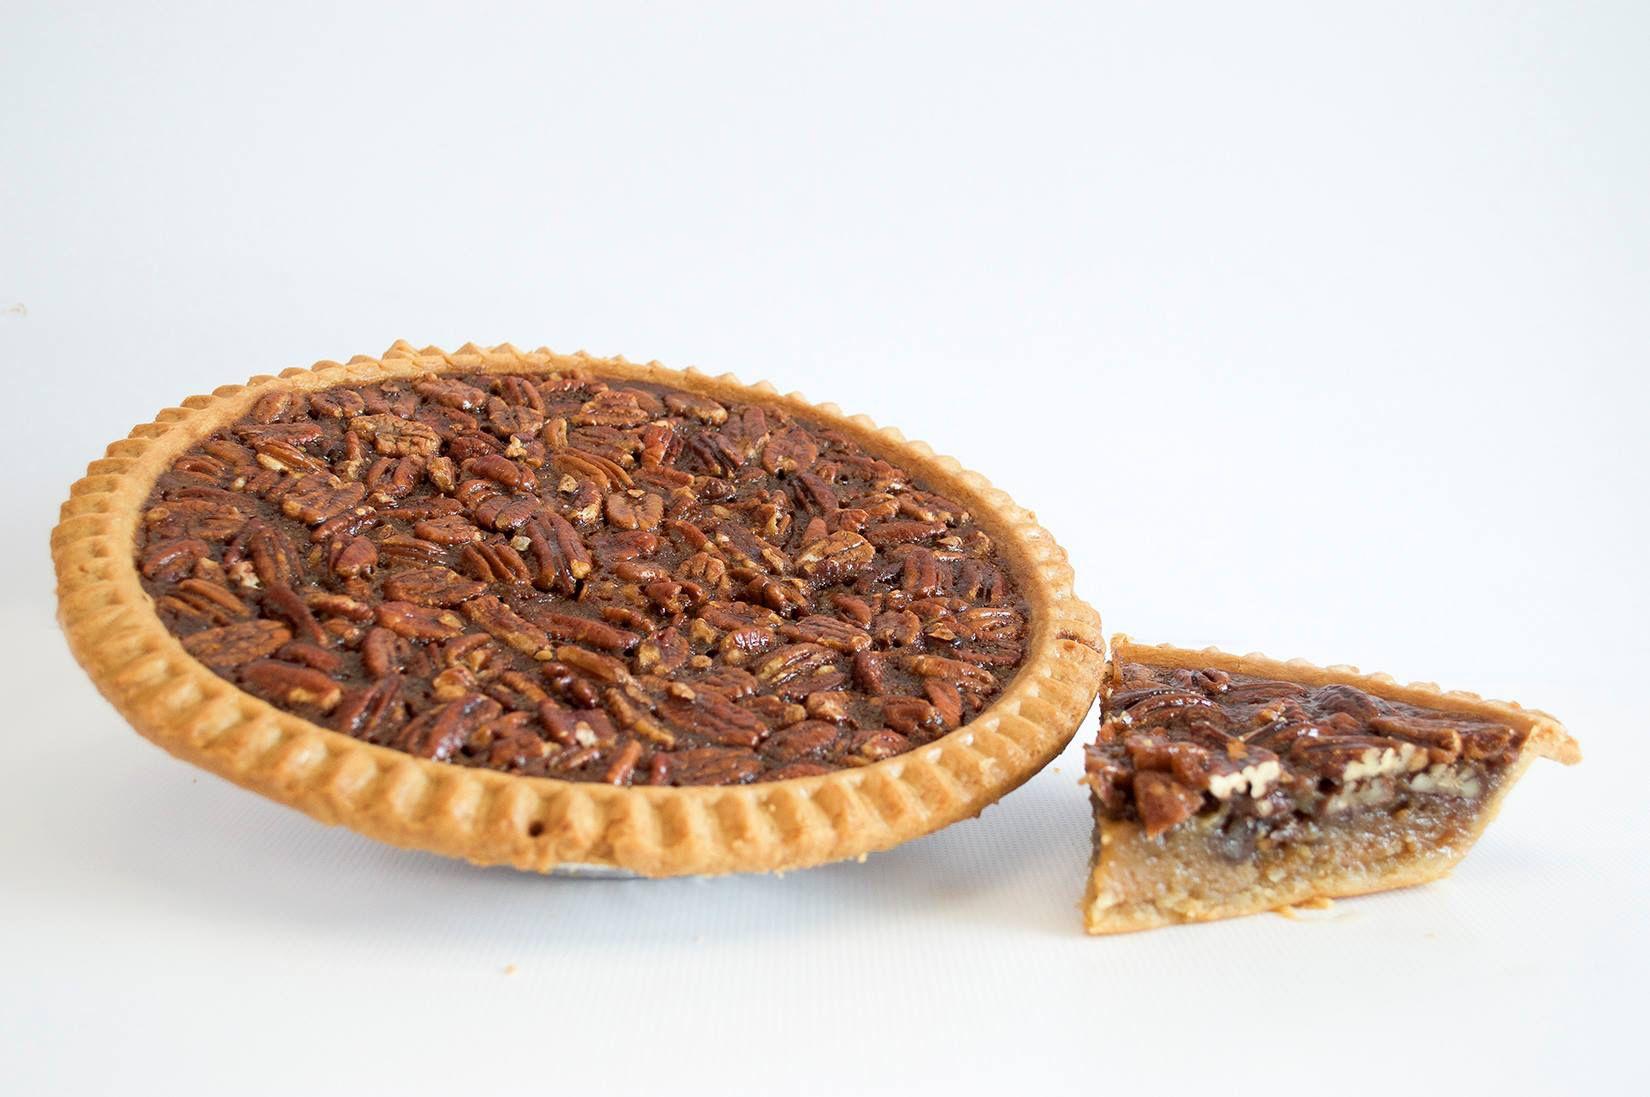 Pecan Pie at Three Brothers Bakery